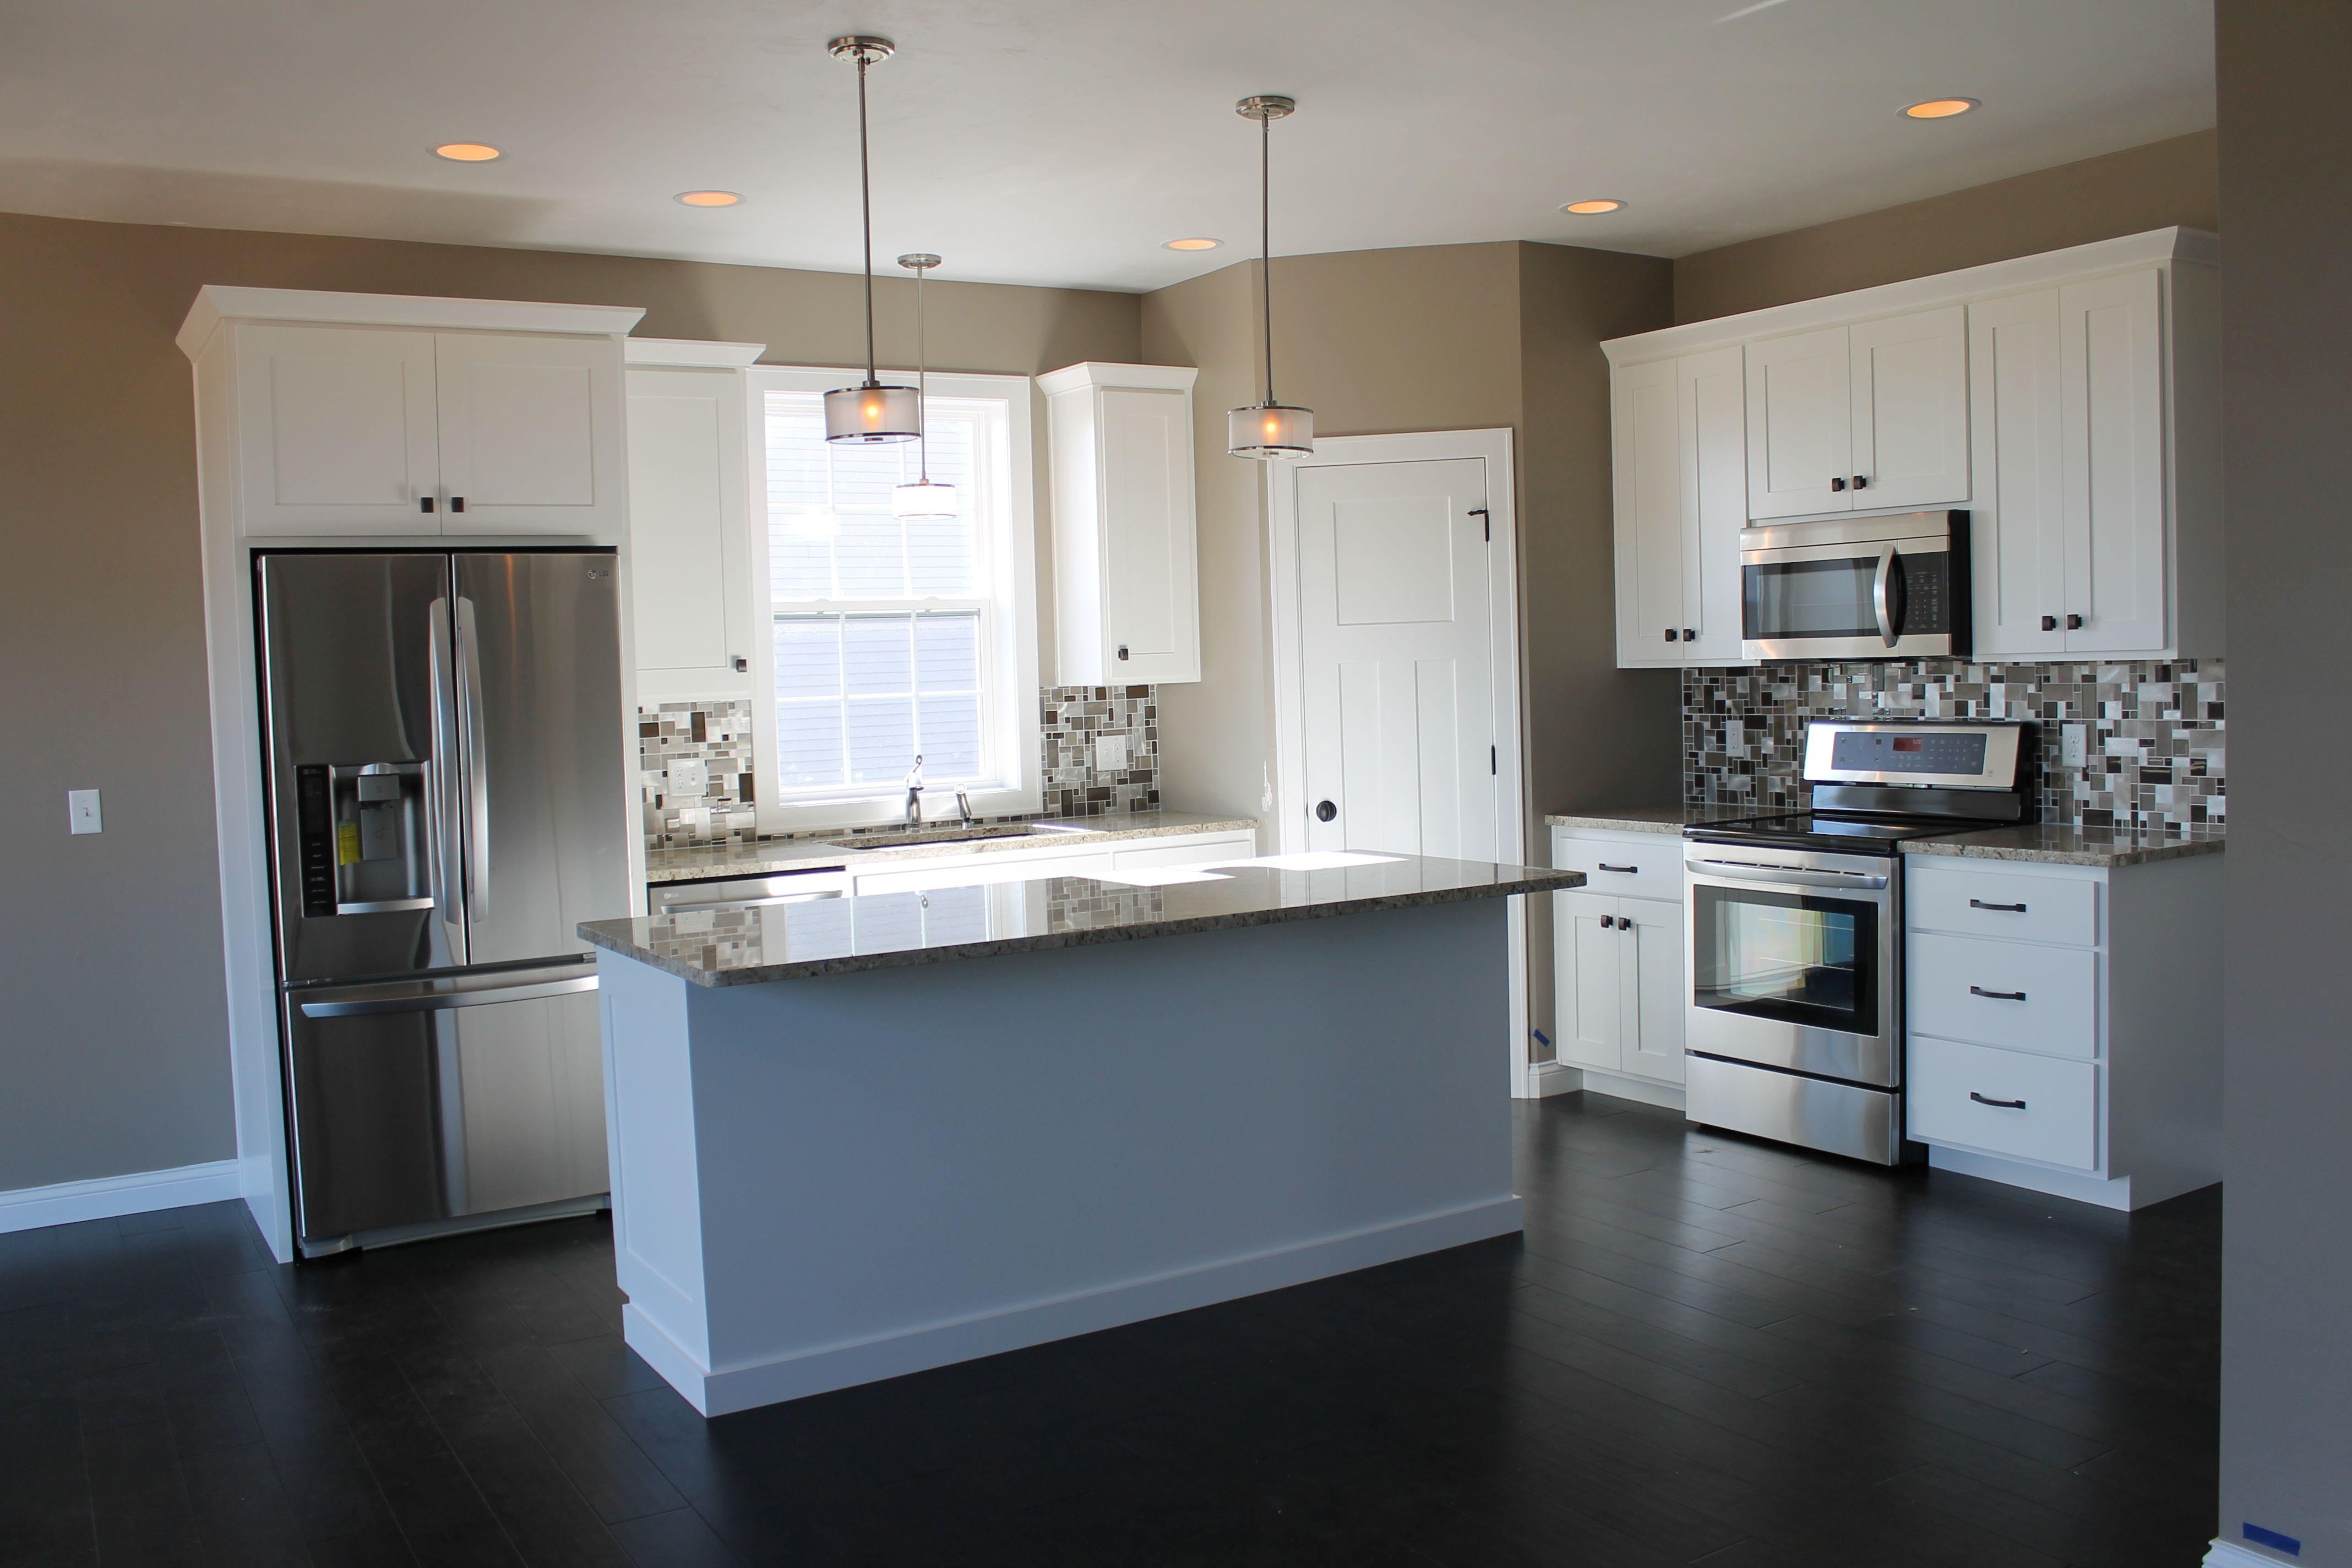 5322 White Kitchen With Large Center Island Kitchen